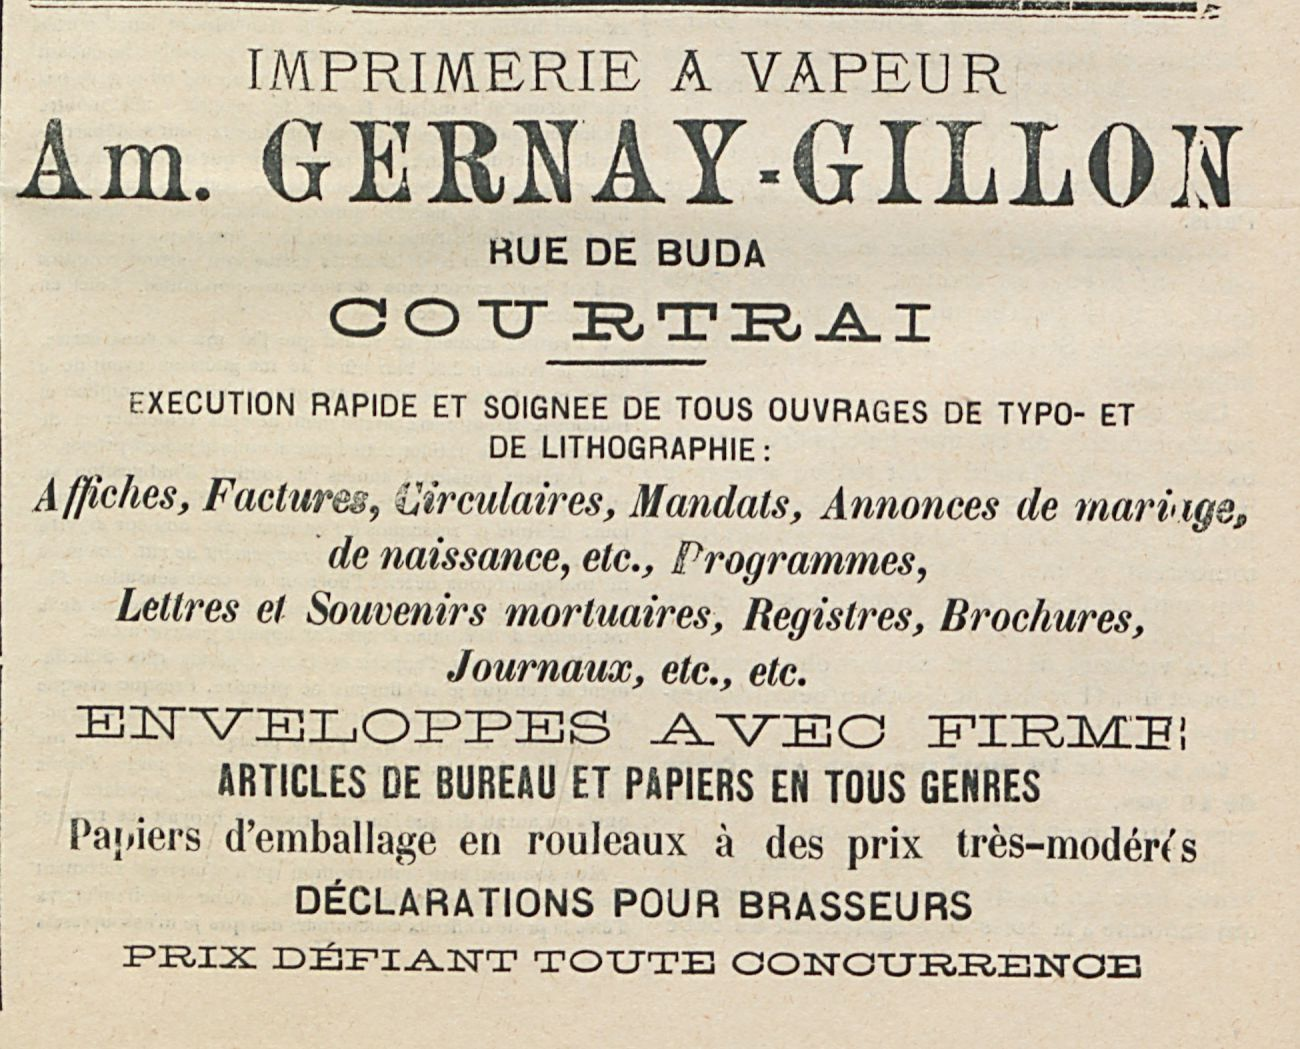 Am. GERNAY-GILLON